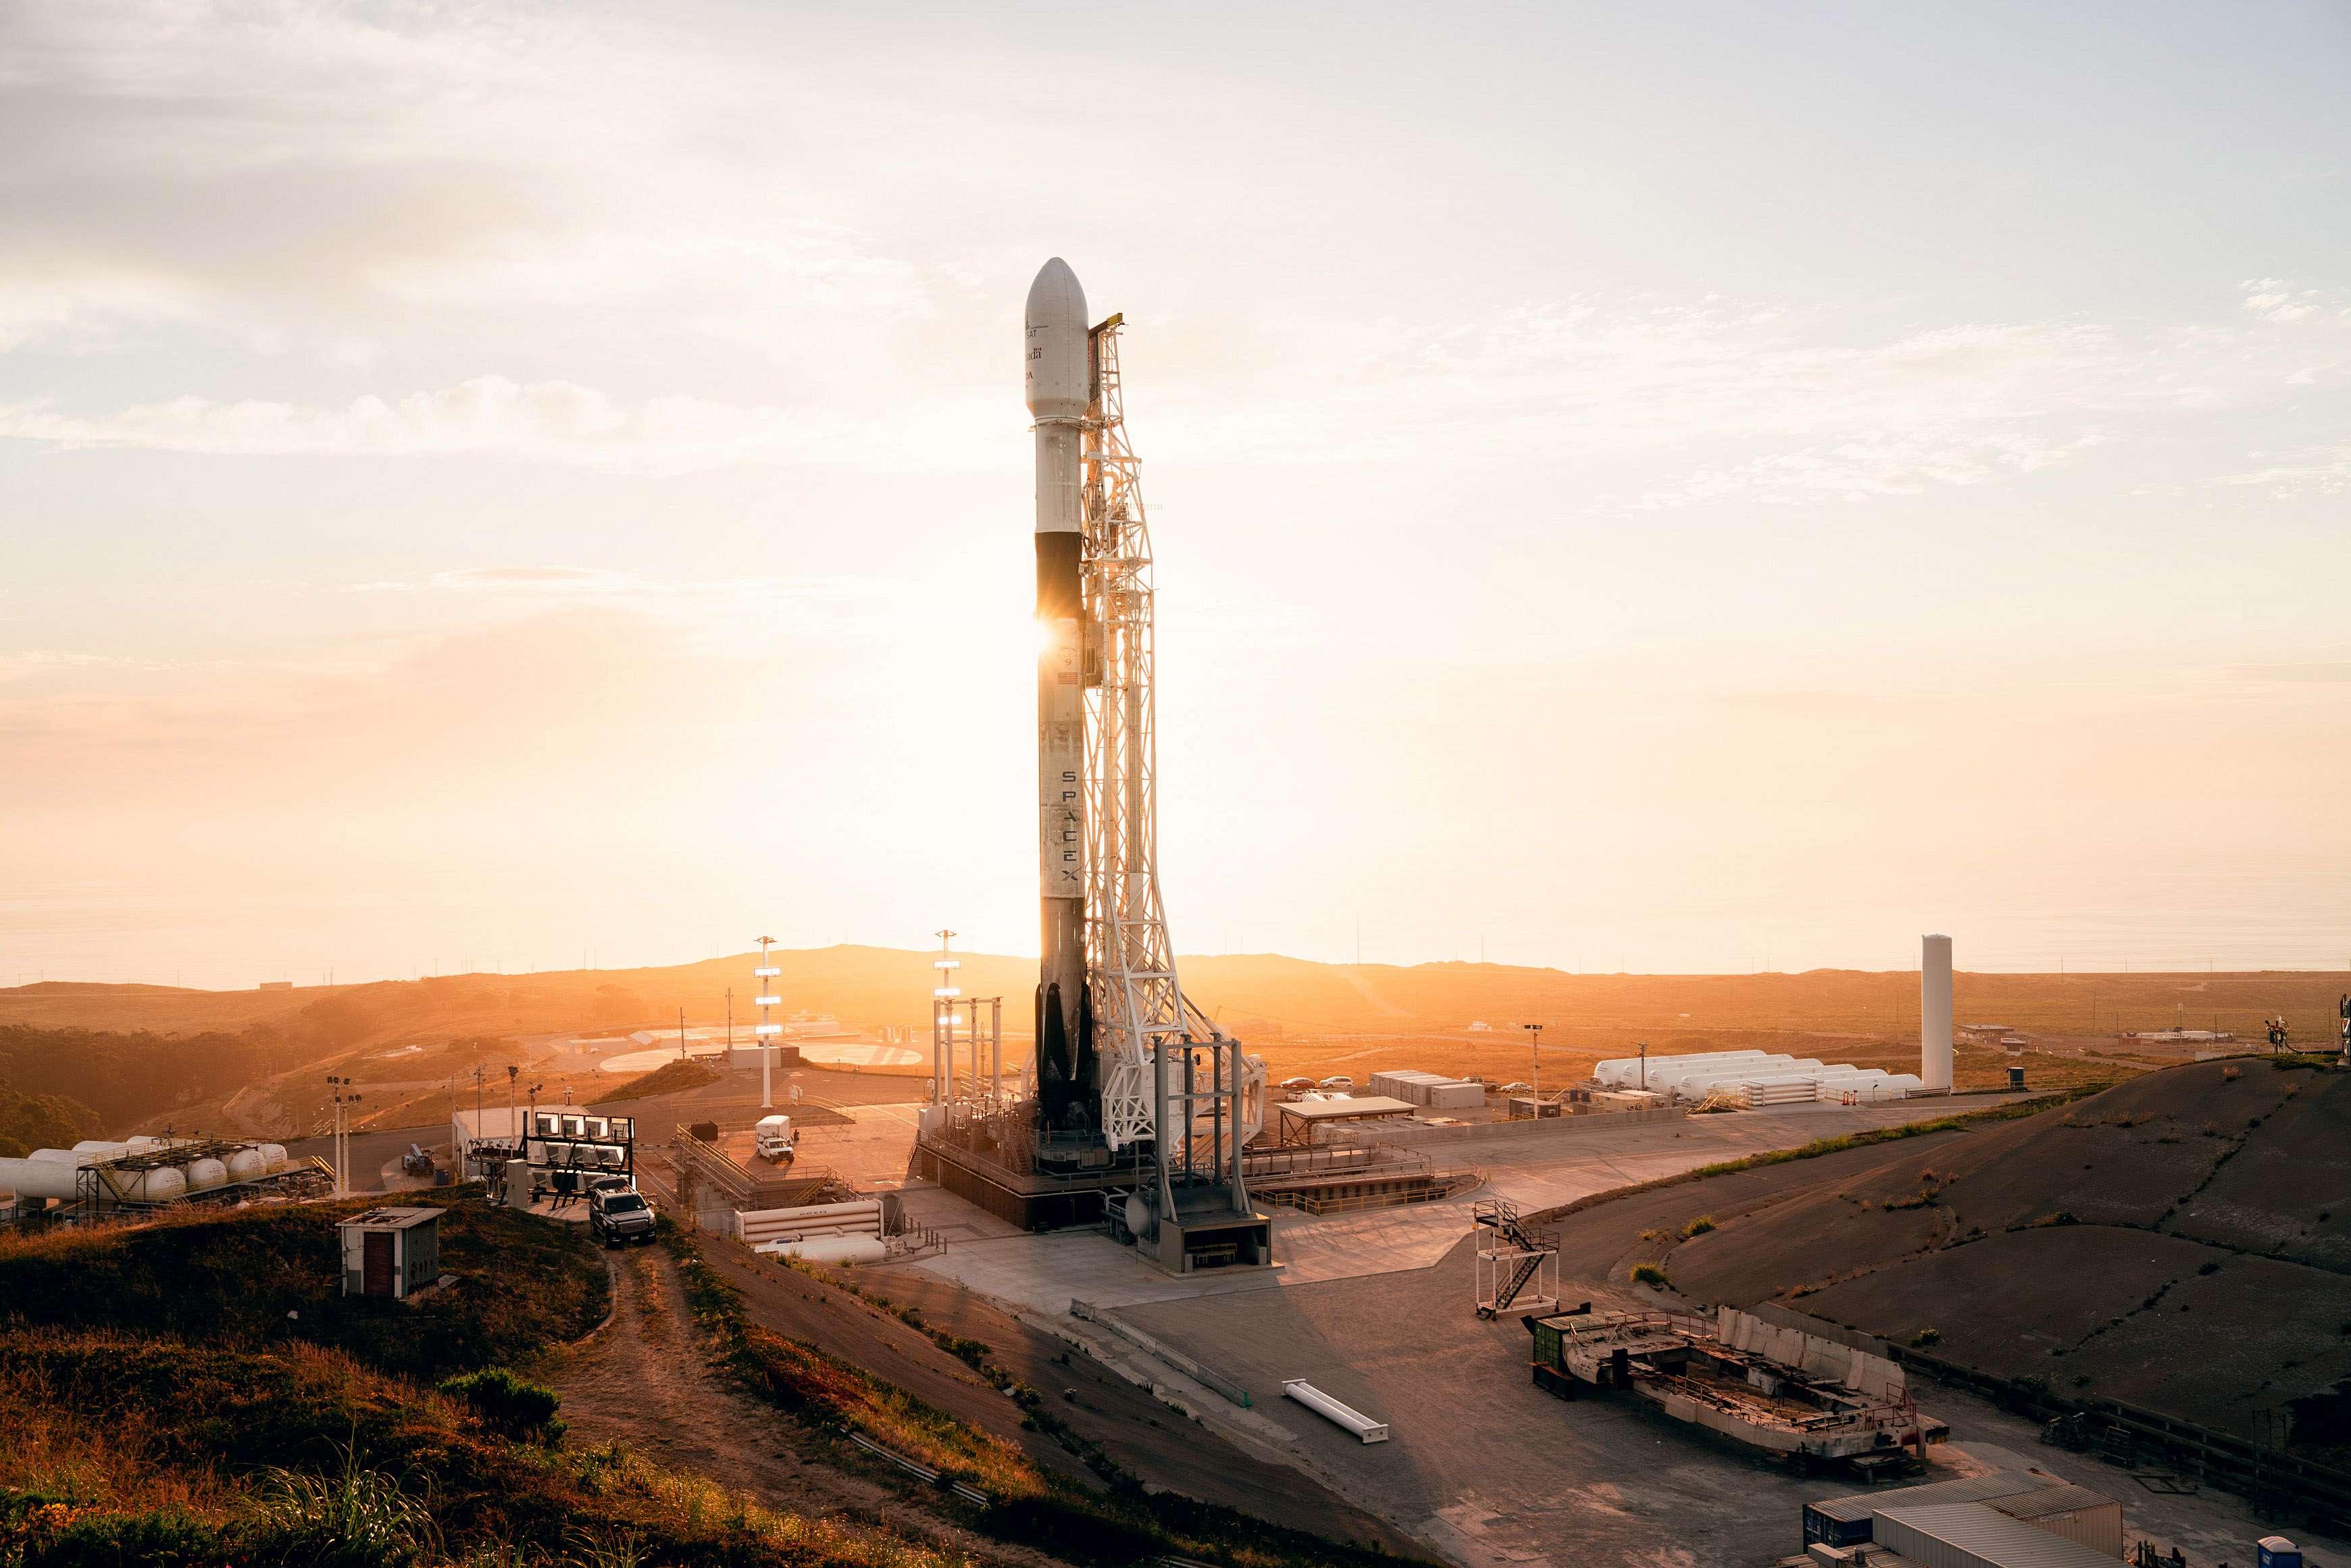 Falcon 9 B1051 SLC-4E RCM vertical SLC-4E (SpaceX) 3 (c)